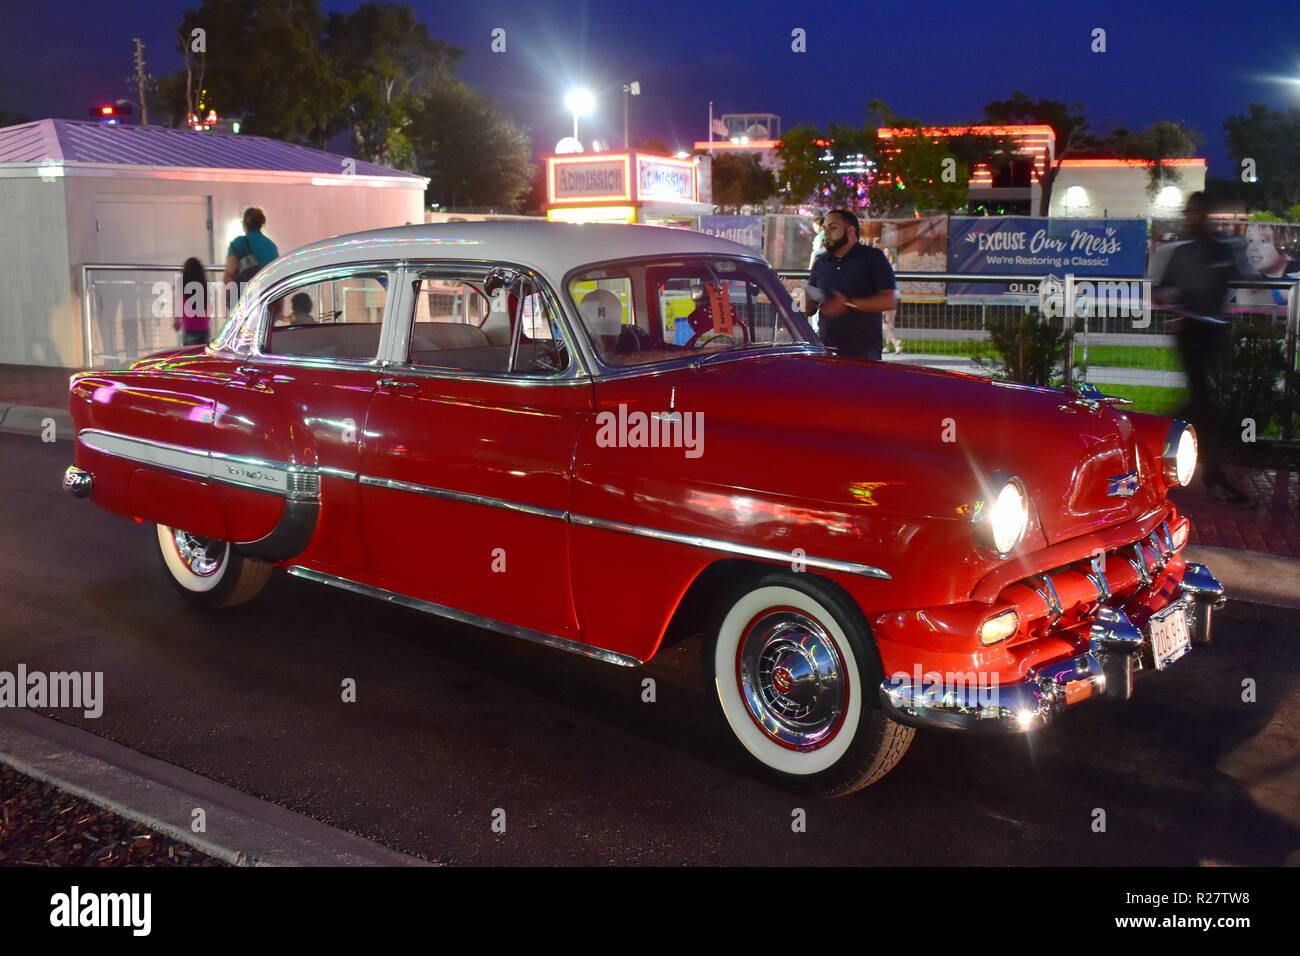 Orlando, Florida  November 02, 2018  Vintange red car in